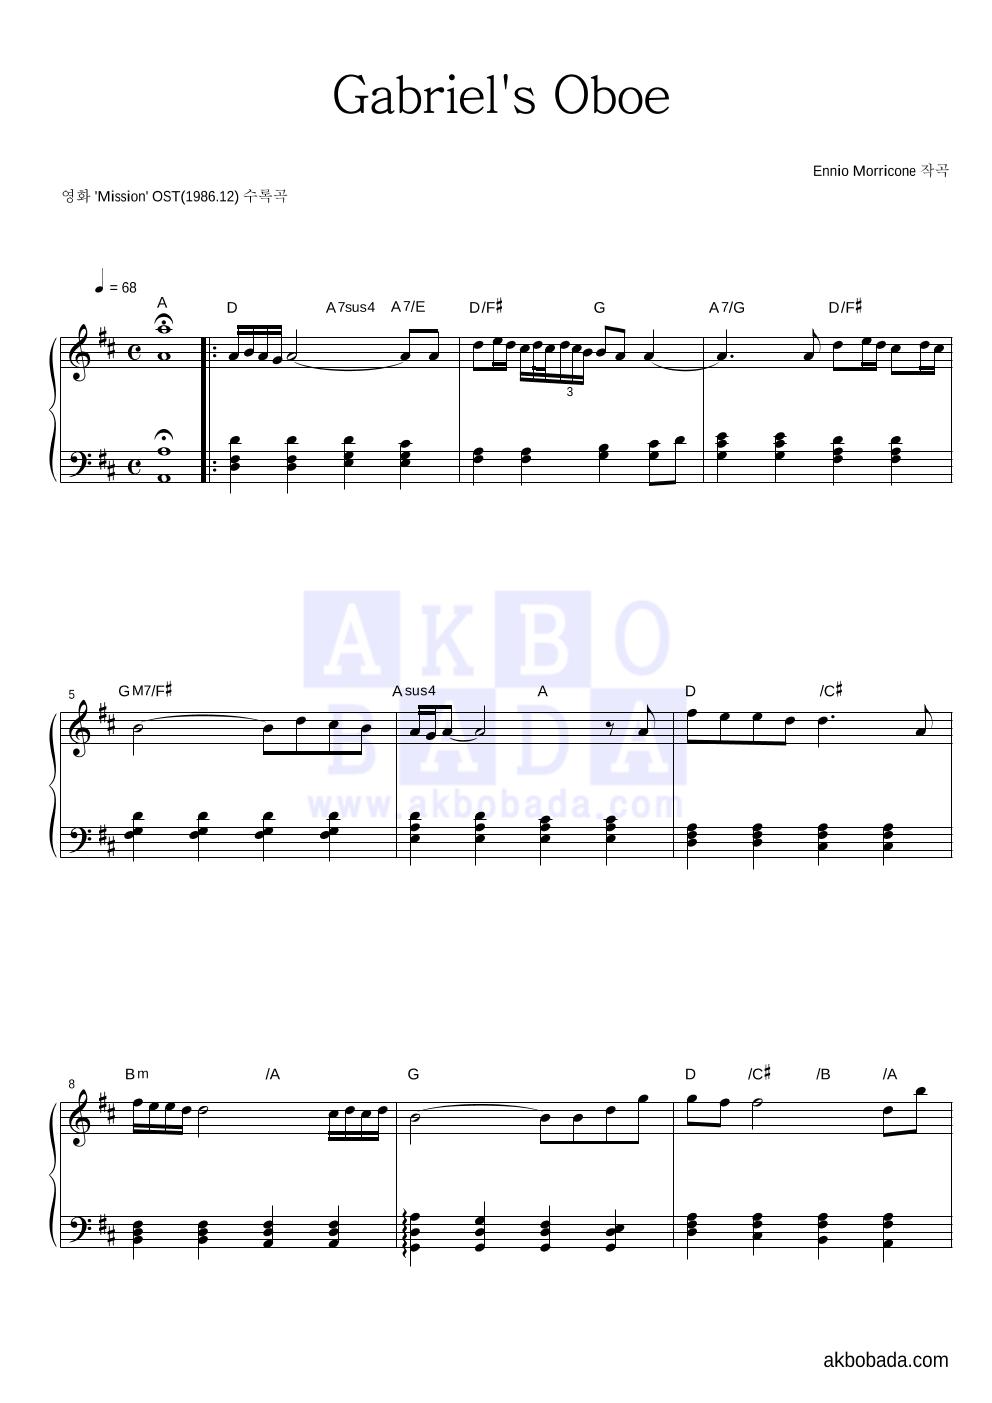 Ennio Morricone - Gabriel's Oboe 피아노 2단 악보